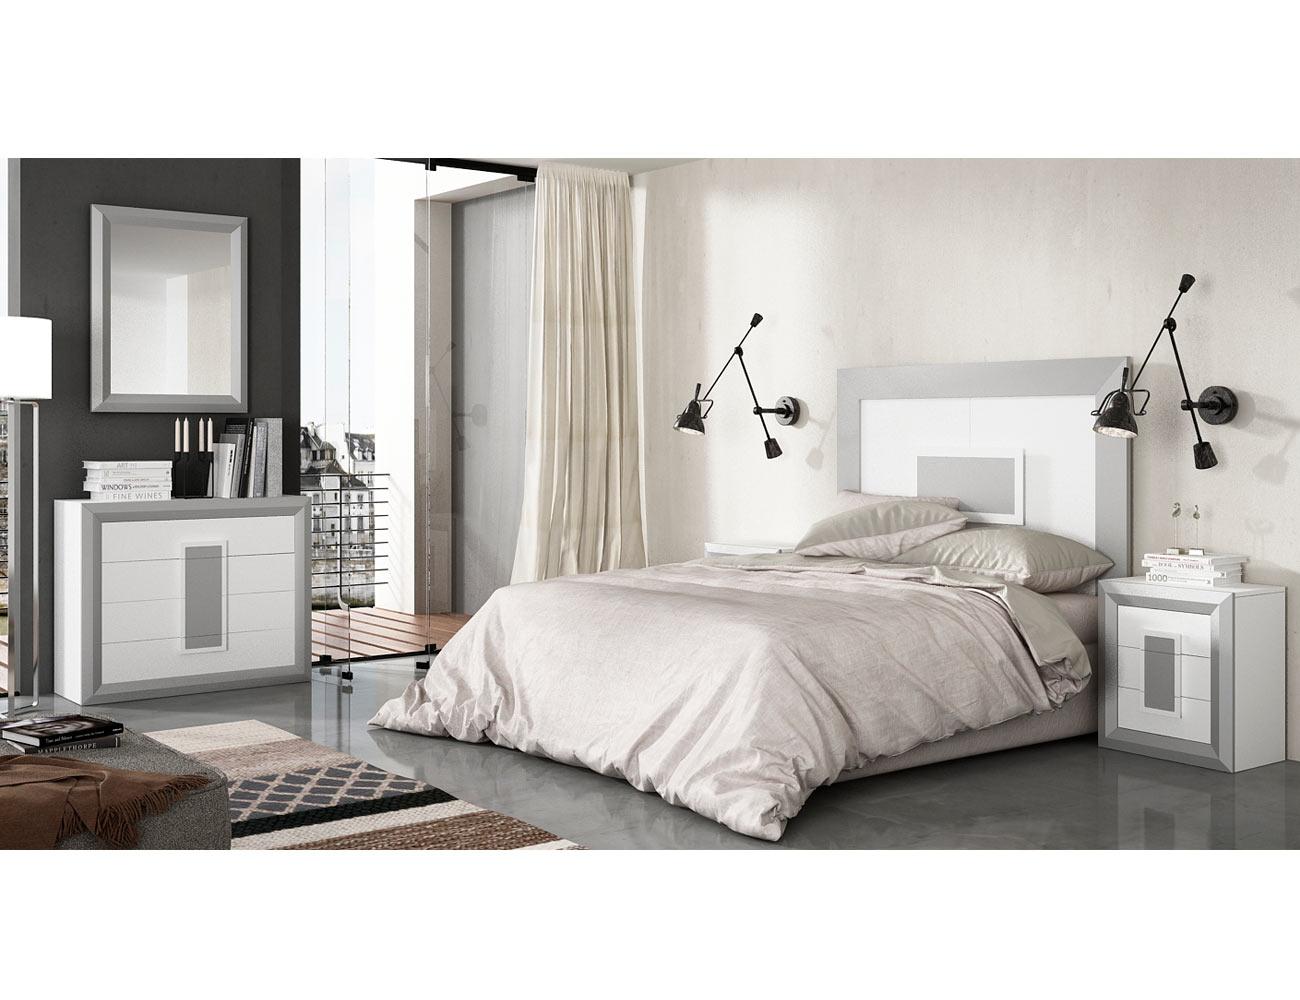 C moda con marco espejo para dormitorio de matrimonio - Comoda mesa extensible ...